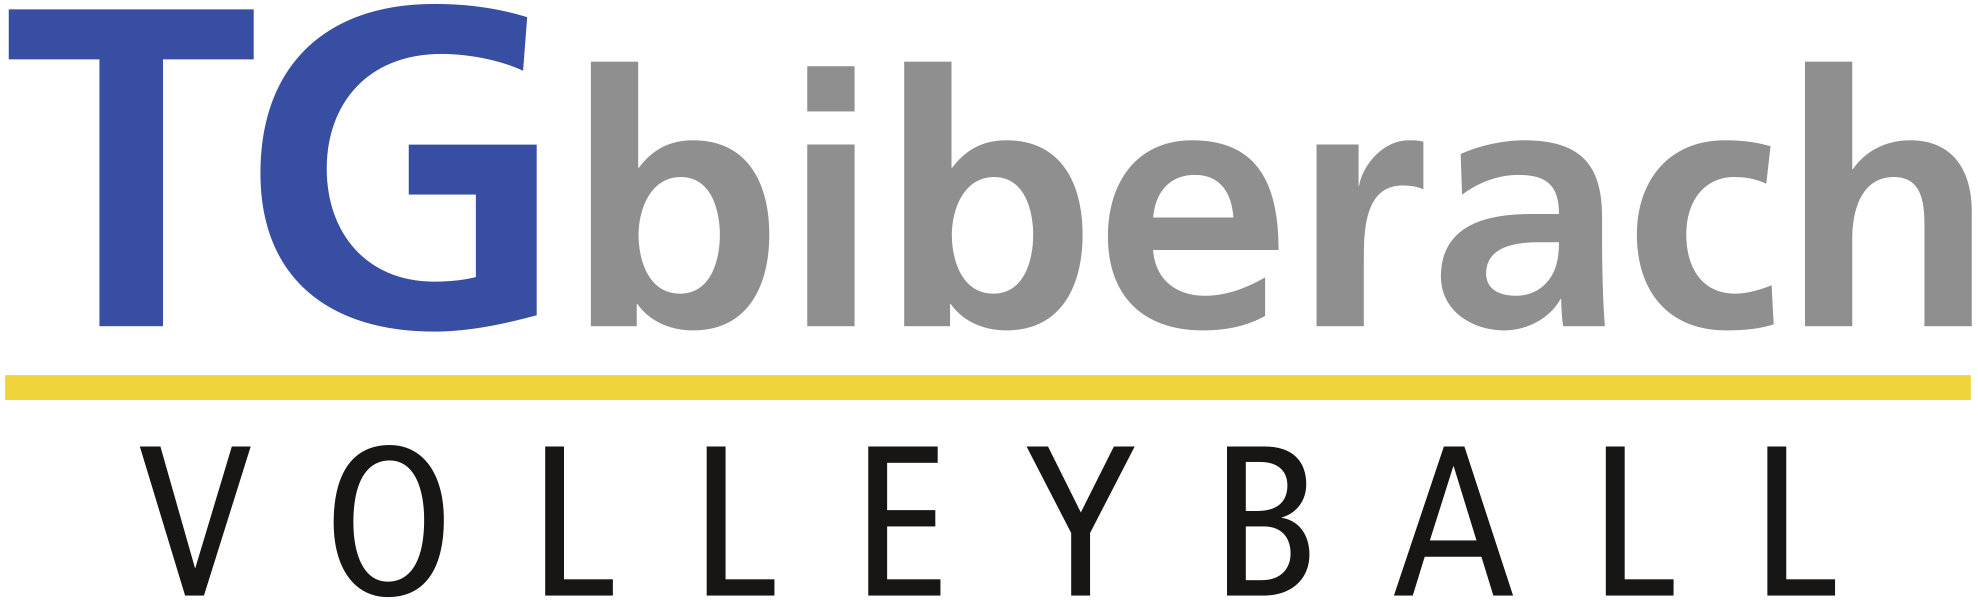 TG Biberach Volleyball